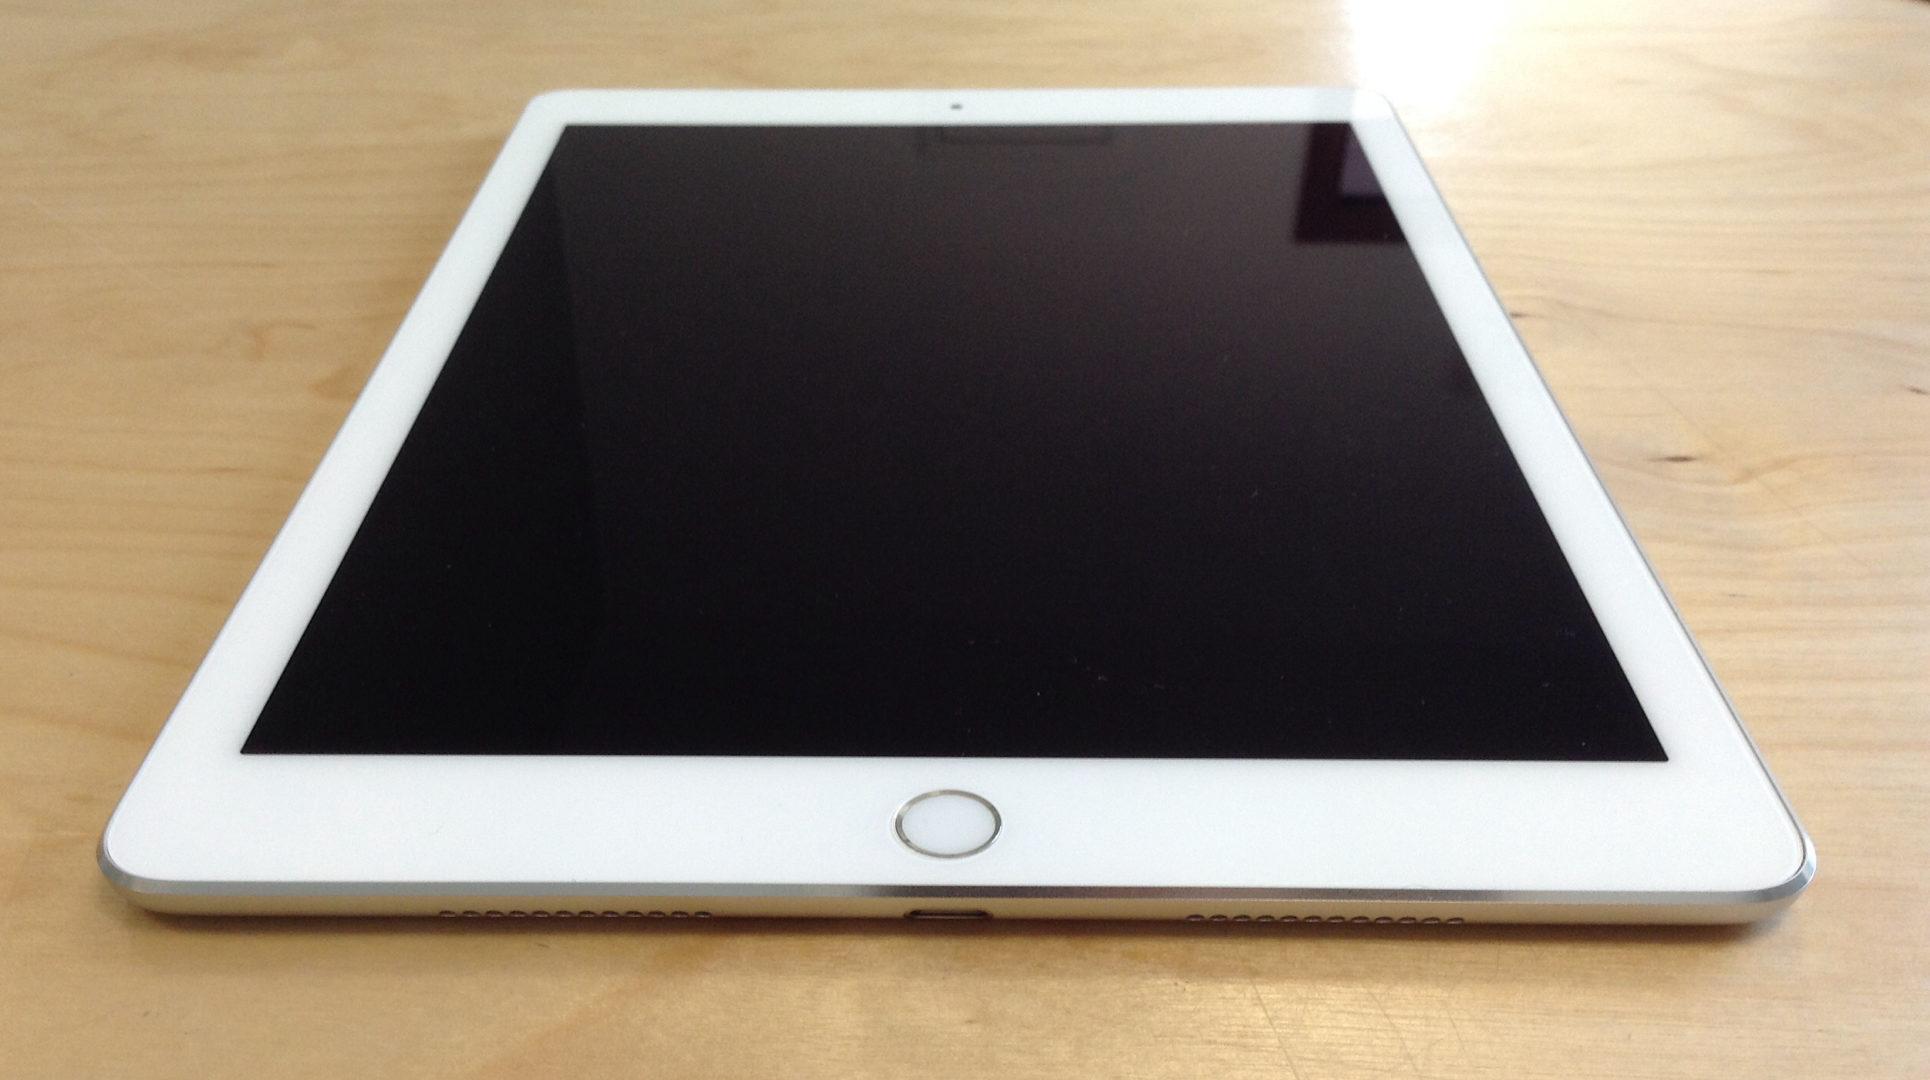 iPad Pro 9.7-inch (Wi-Fi), 128 GB, Gold, imagen 5